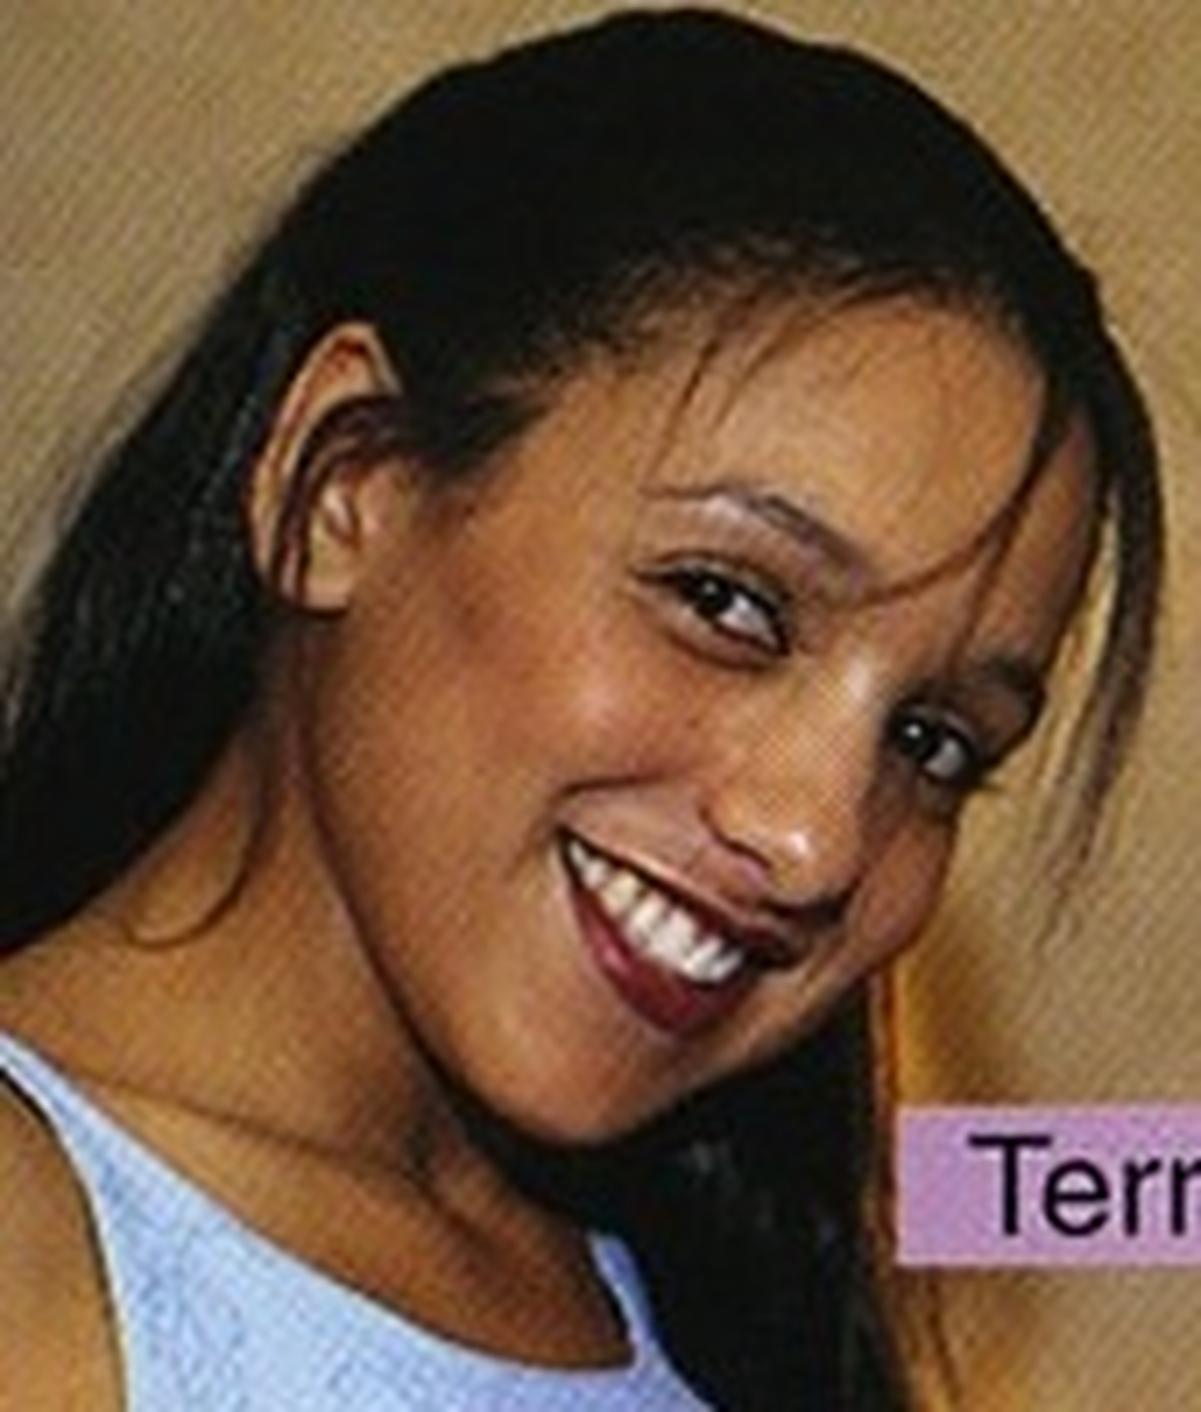 Francesca Neeme